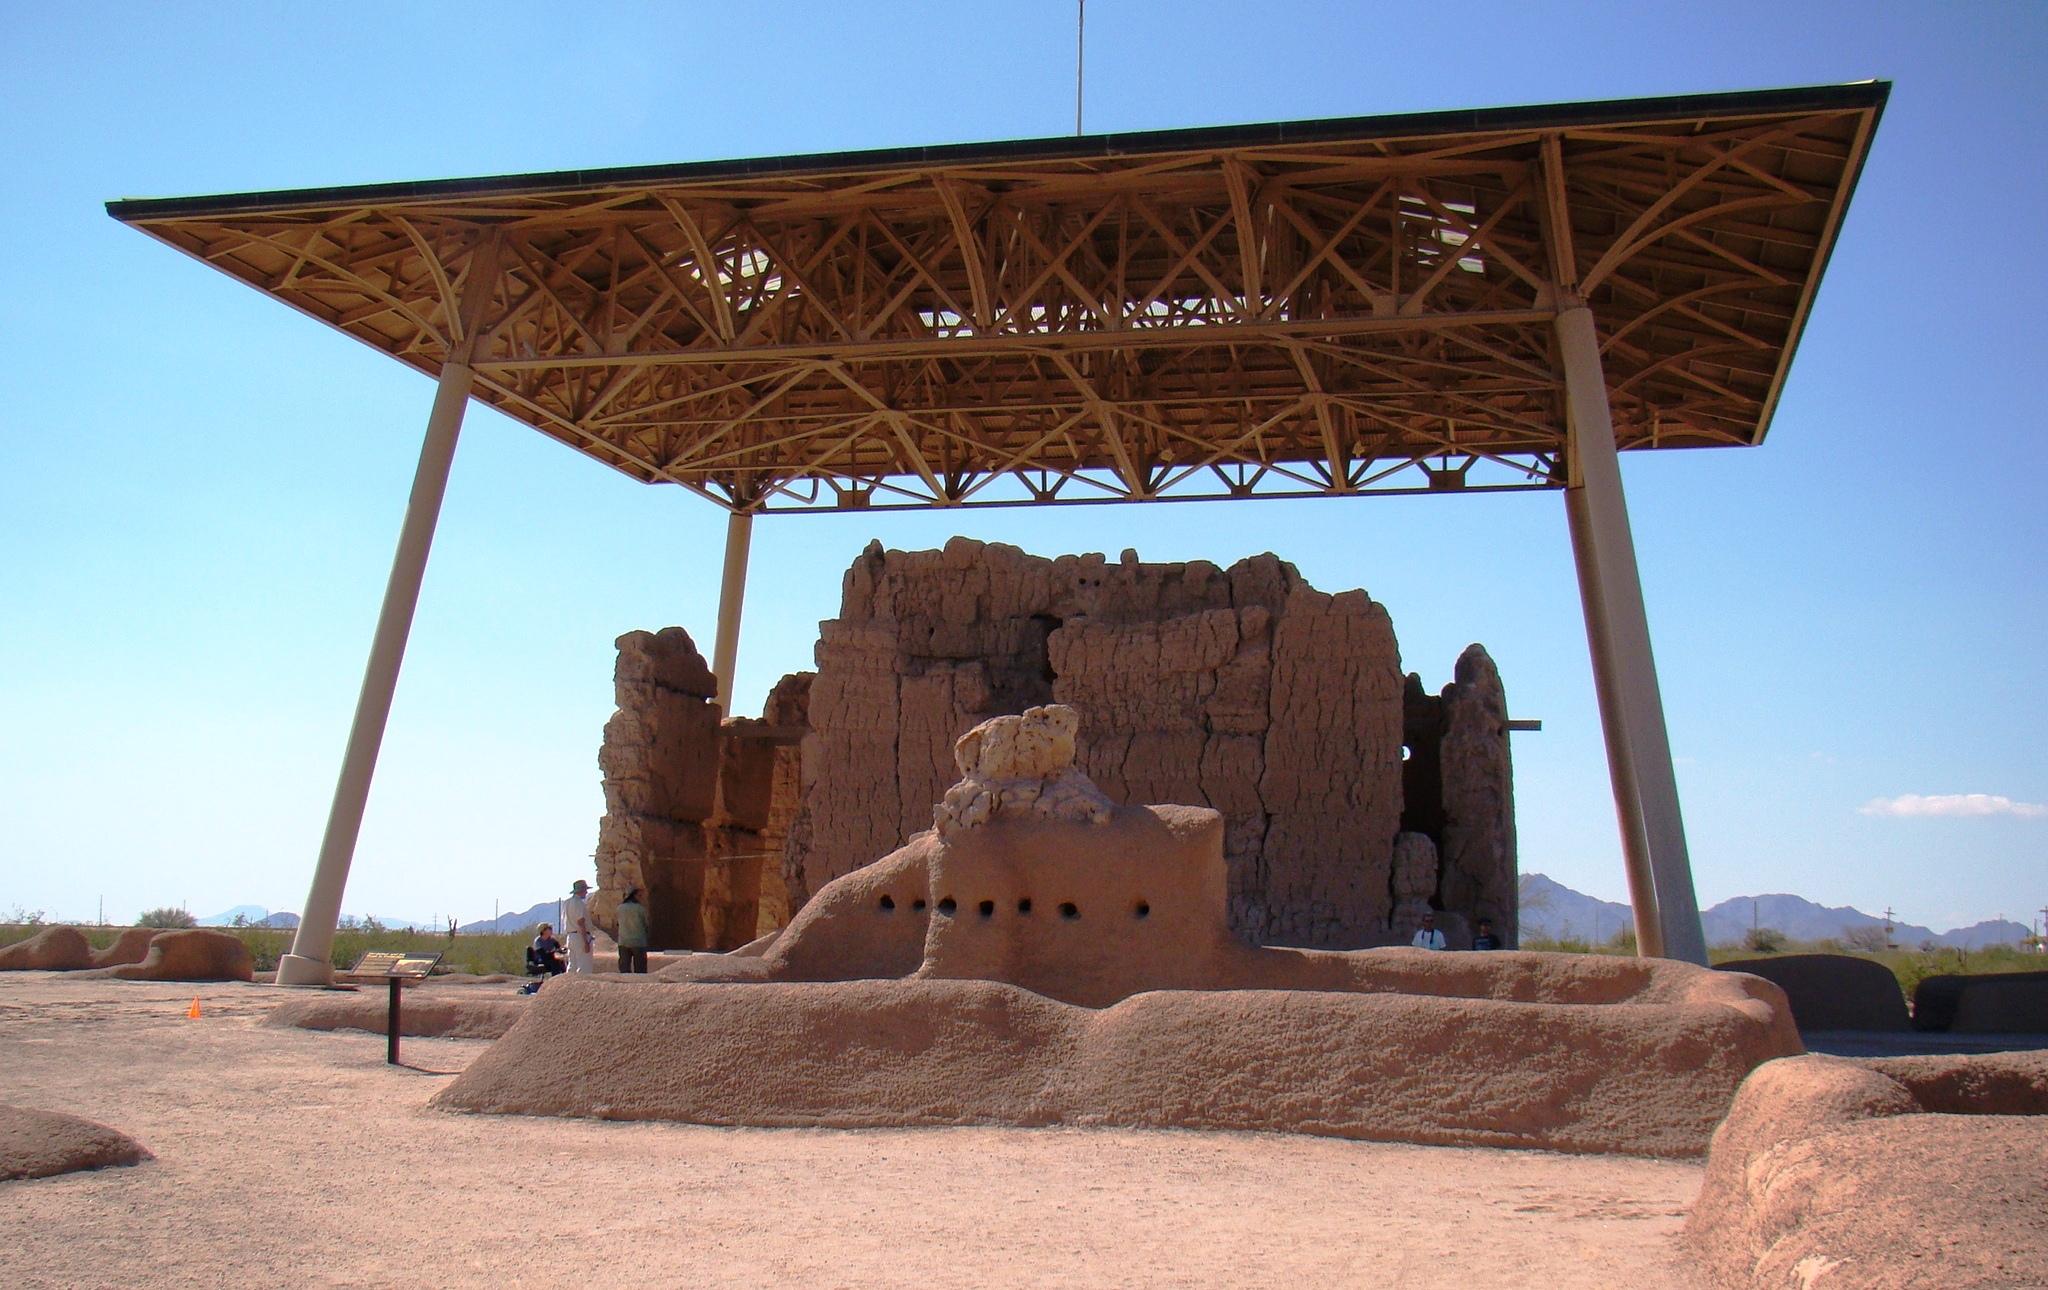 Casa Grande Ruins National Monument – Travel guide at Wikivoyage